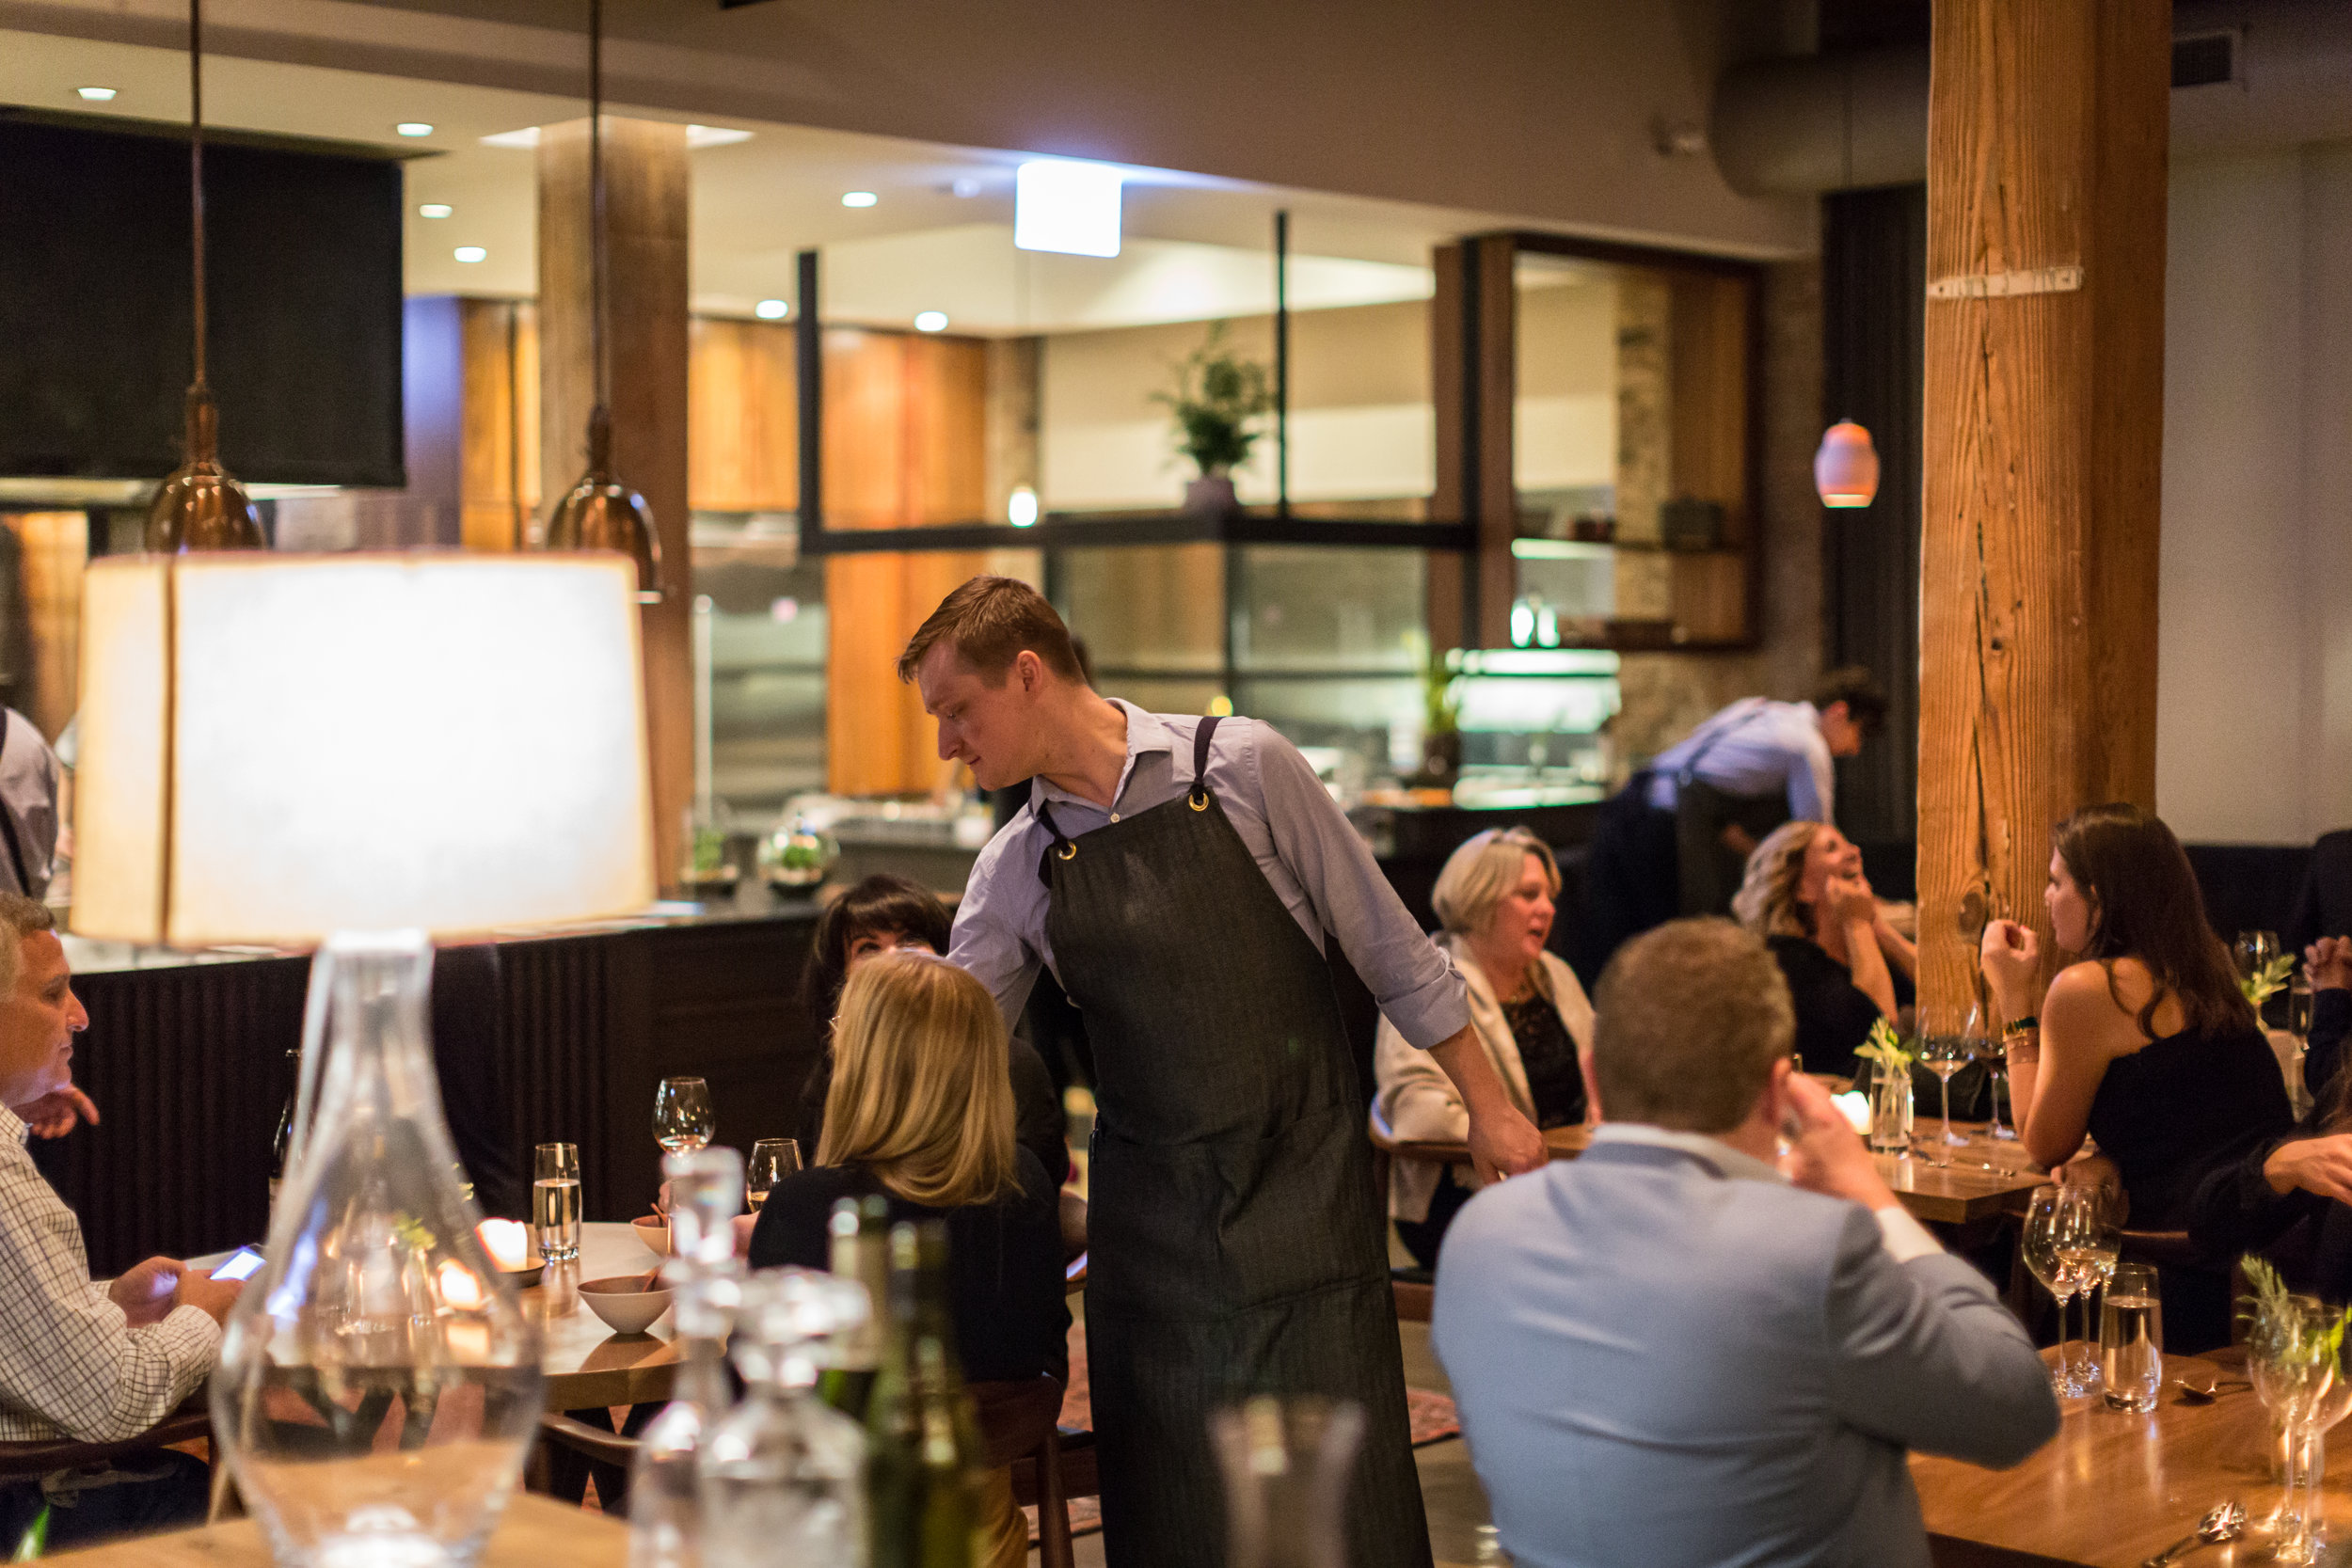 studio-saint-bars-and-restaurants-smyth-and-the-loyalist-washington-dc-14